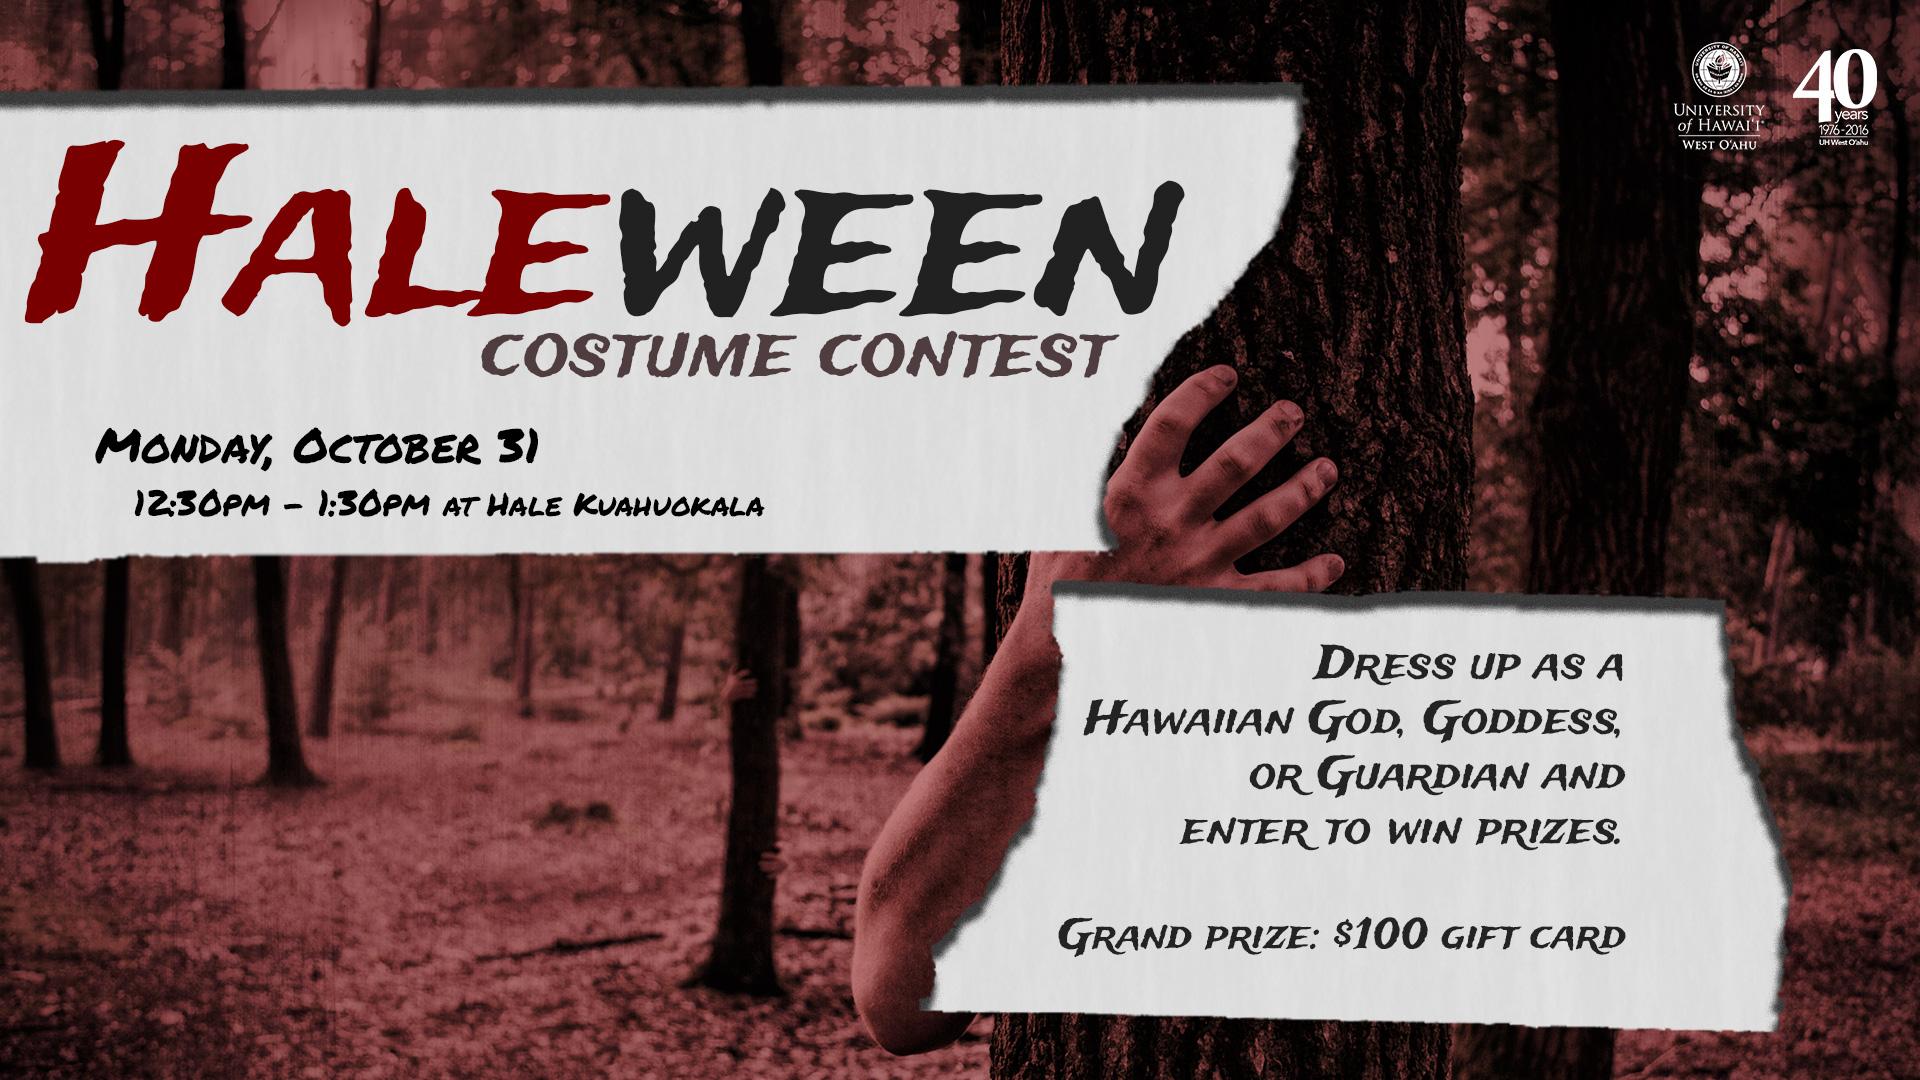 Hale-ween Costume Contest